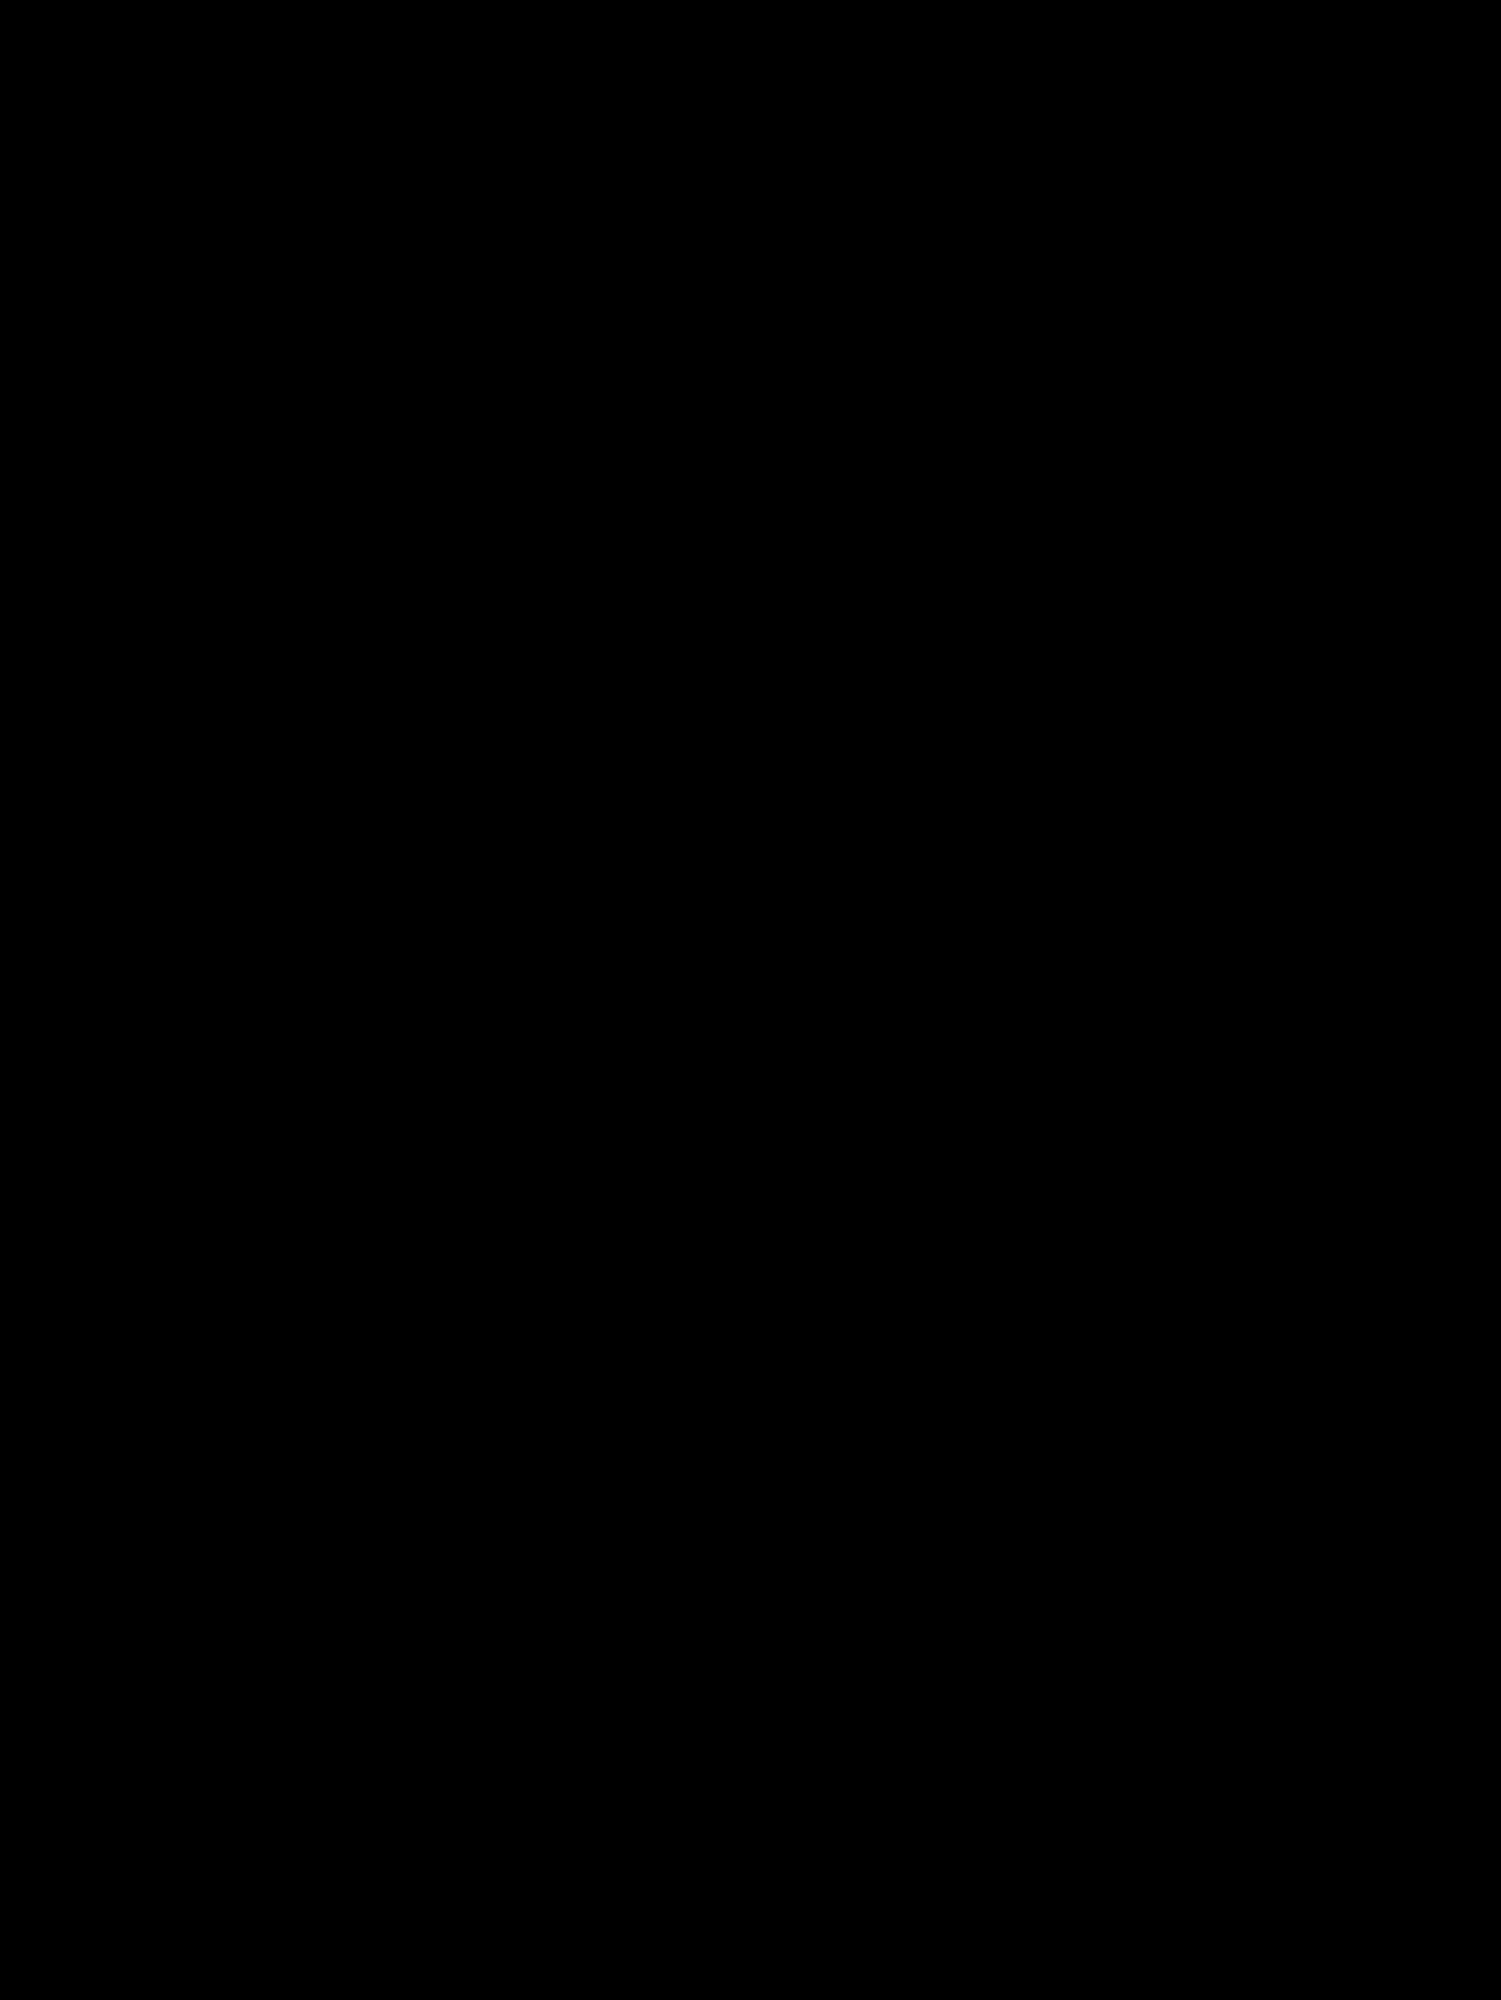 Contact-logo-black.png